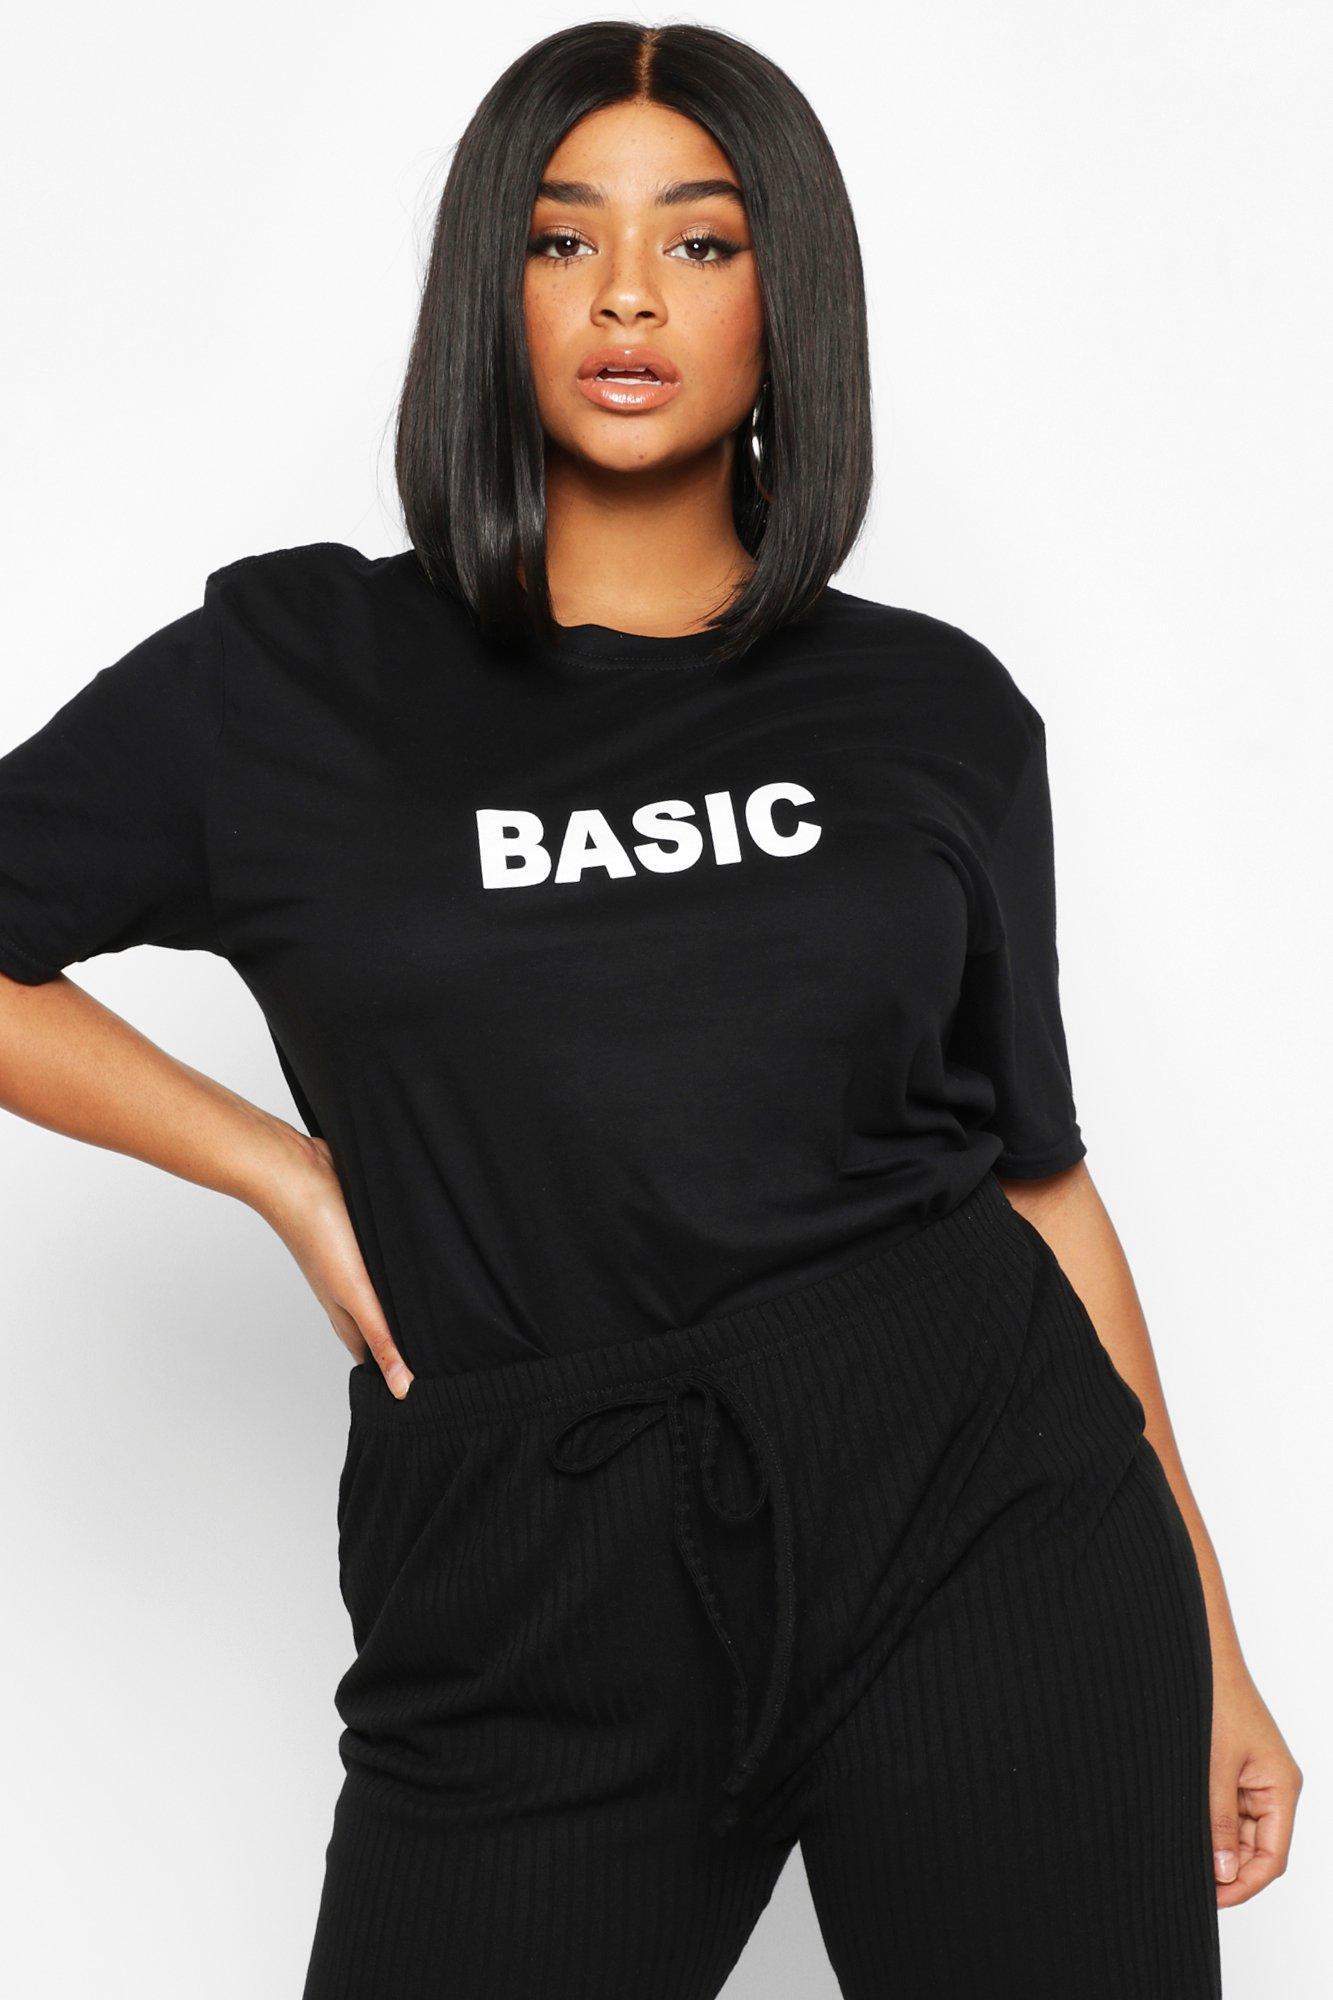 Womens Plus 'Basic' T-Shirts - schwarz - 50, Schwarz - Boohoo.com